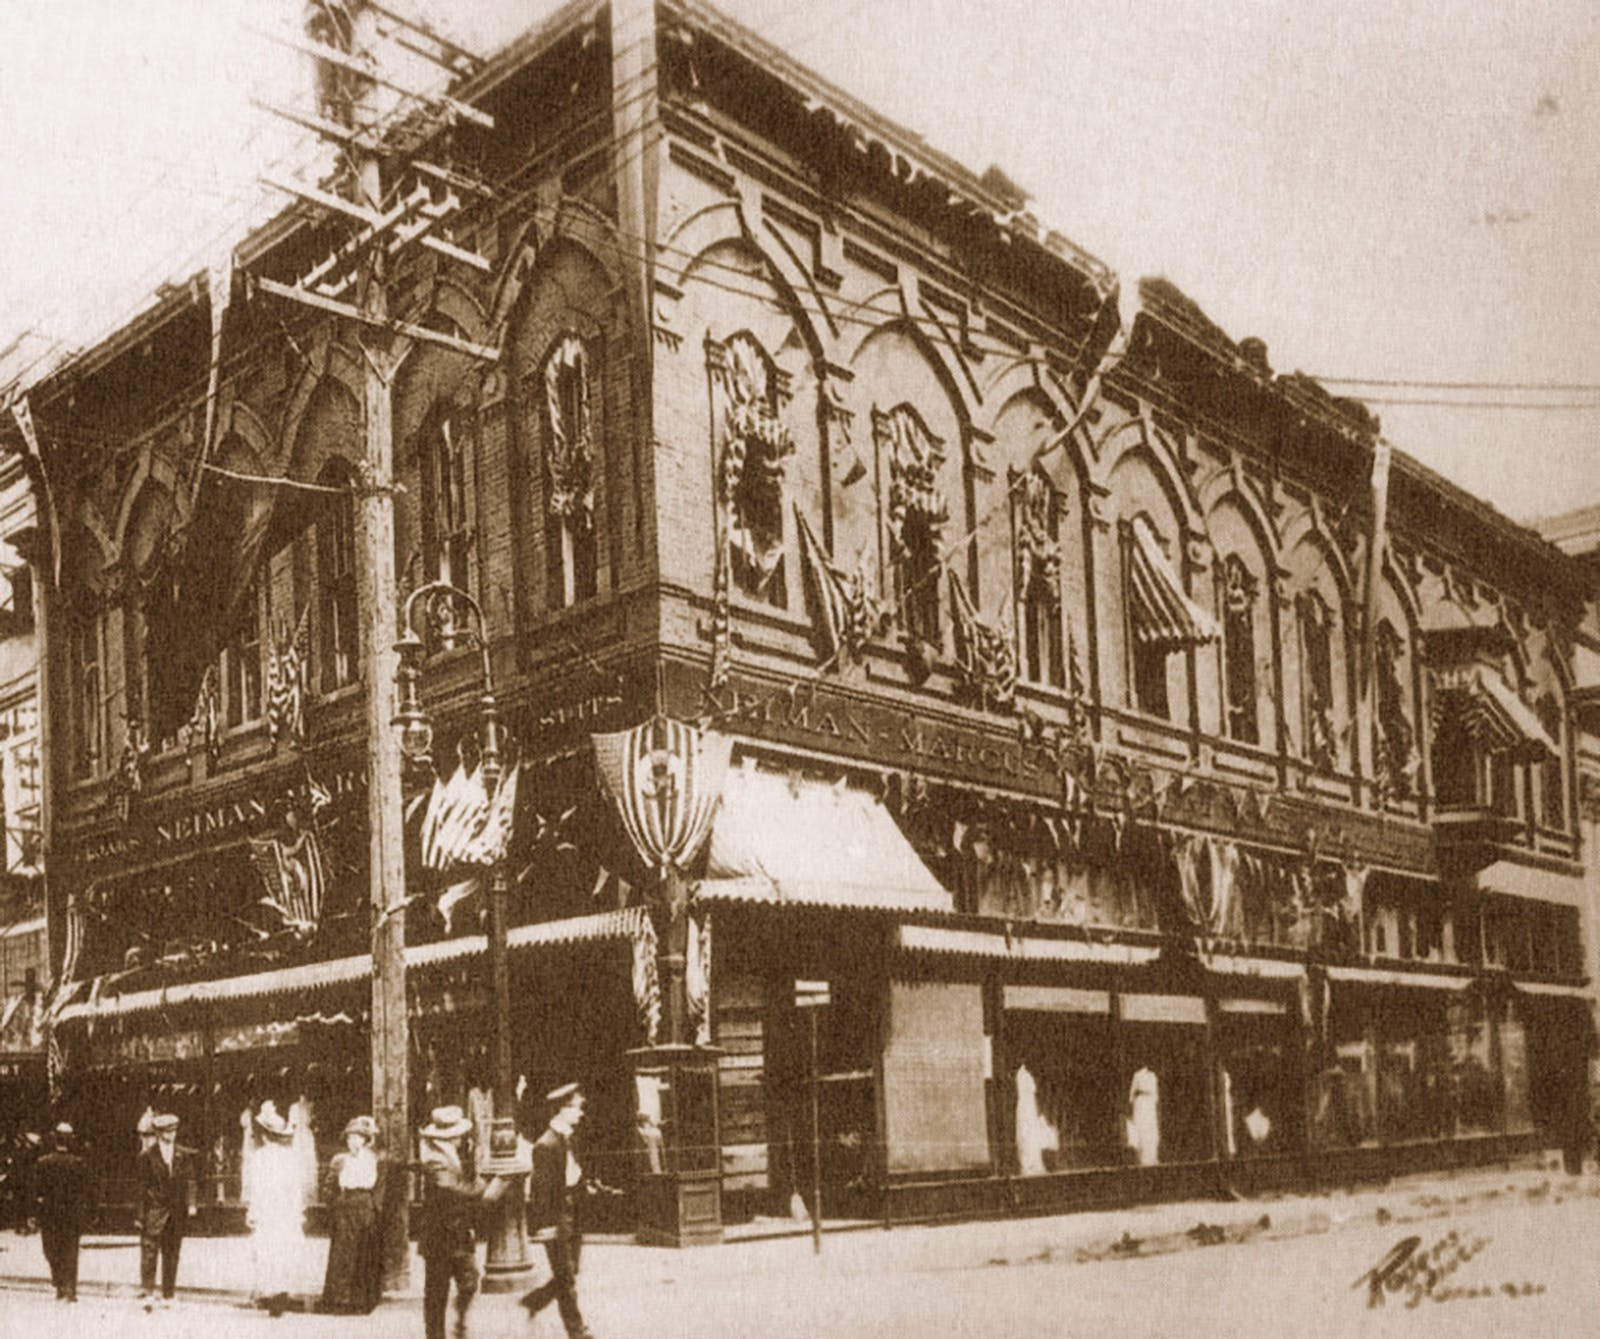 original-neiman-marcus-store-on-elm-street